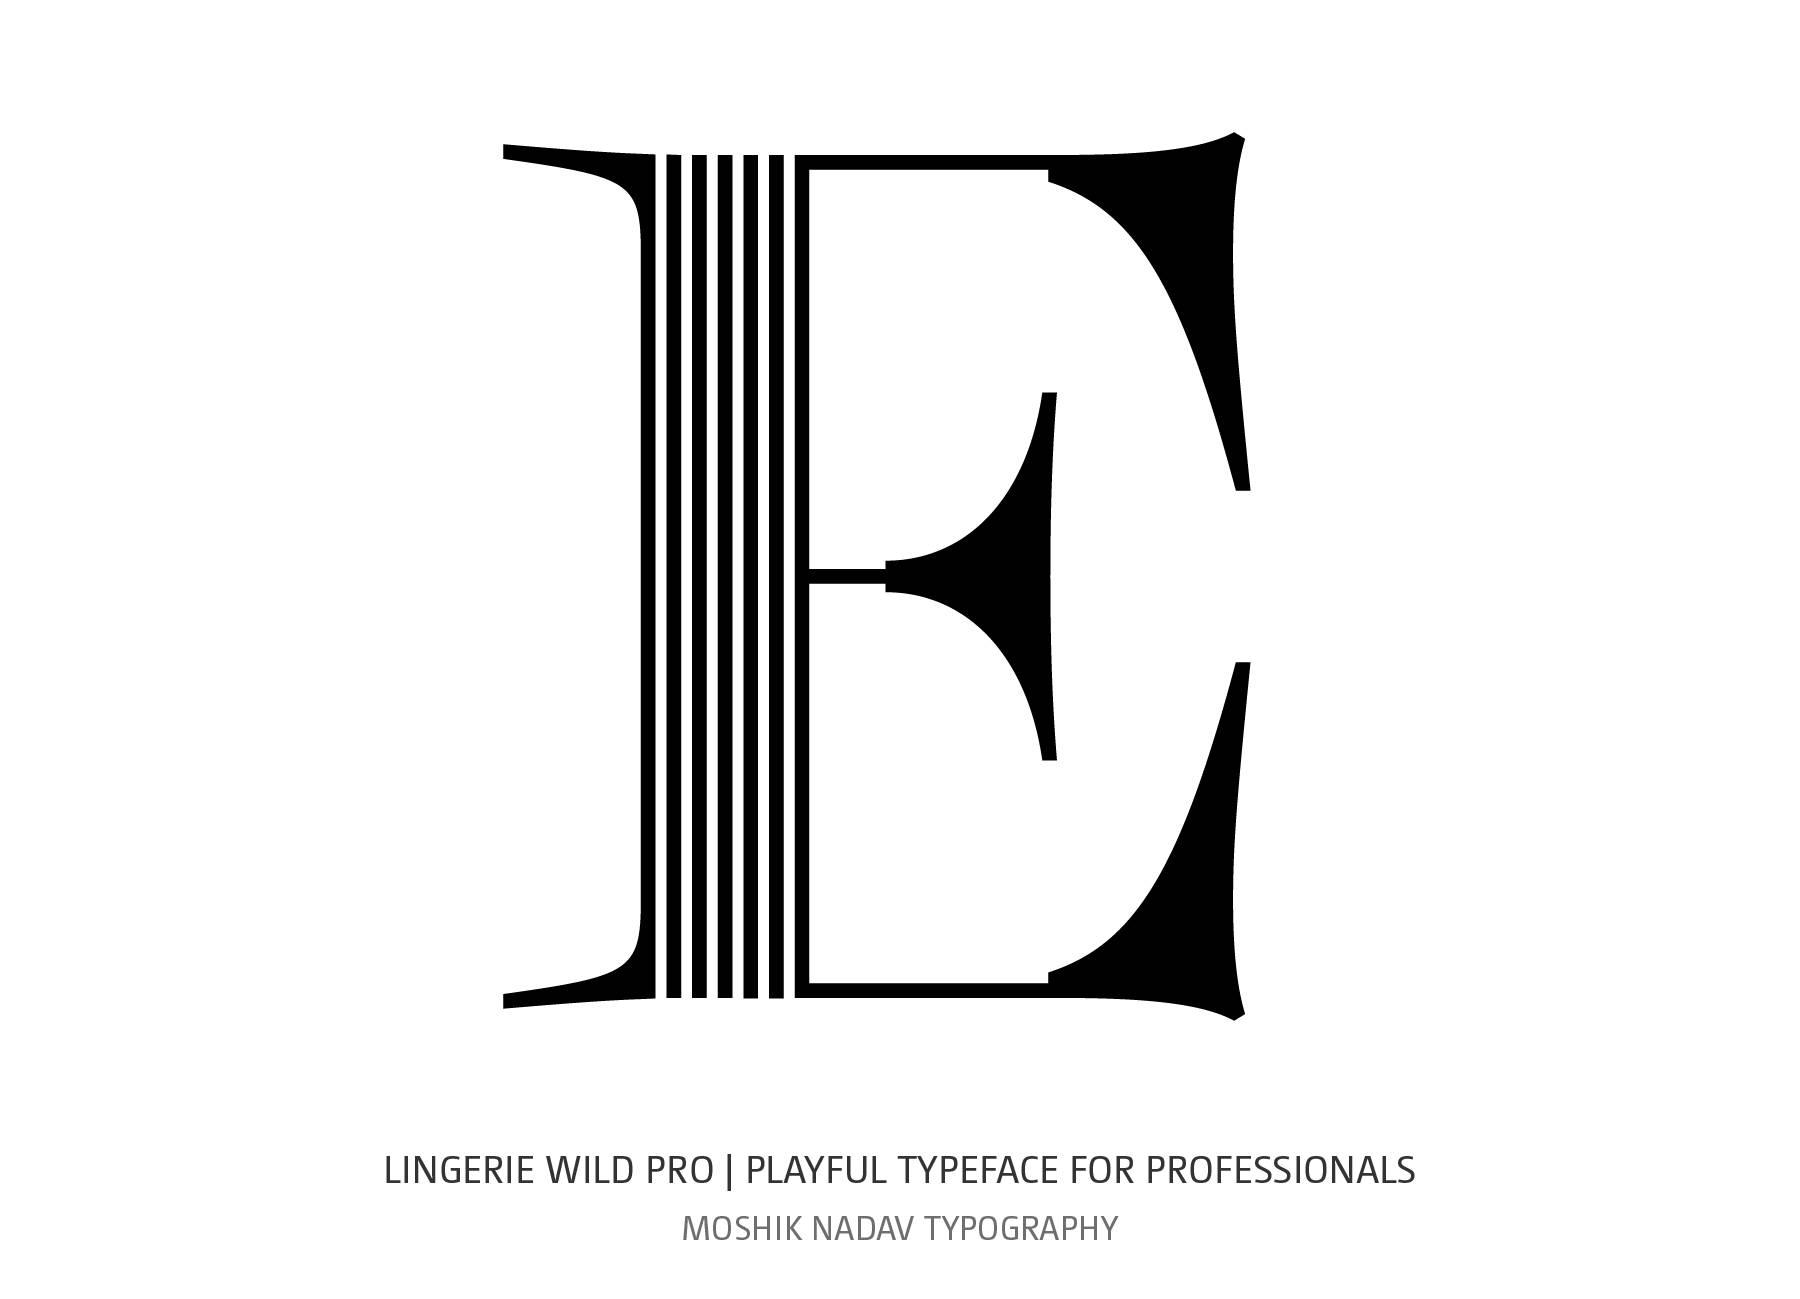 Fashion magazine font - Lingerie Wild Pro Typeface by Moshik Nadav Typography